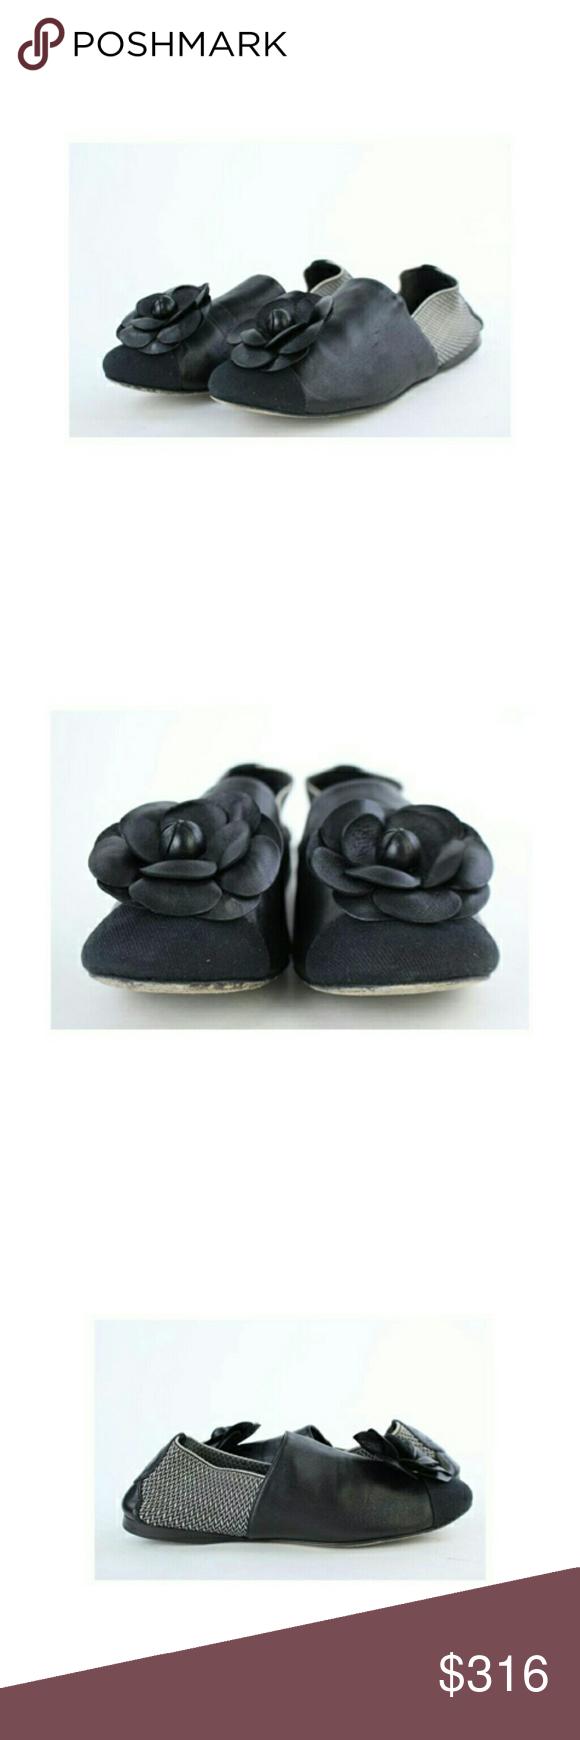 4096b3da1e73 Spotted while shopping on Poshmark  Chanel Black Camellia Ballerina 14ct927  Flats!  poshmark  fashion  shopping  style  CHANEL  Shoes